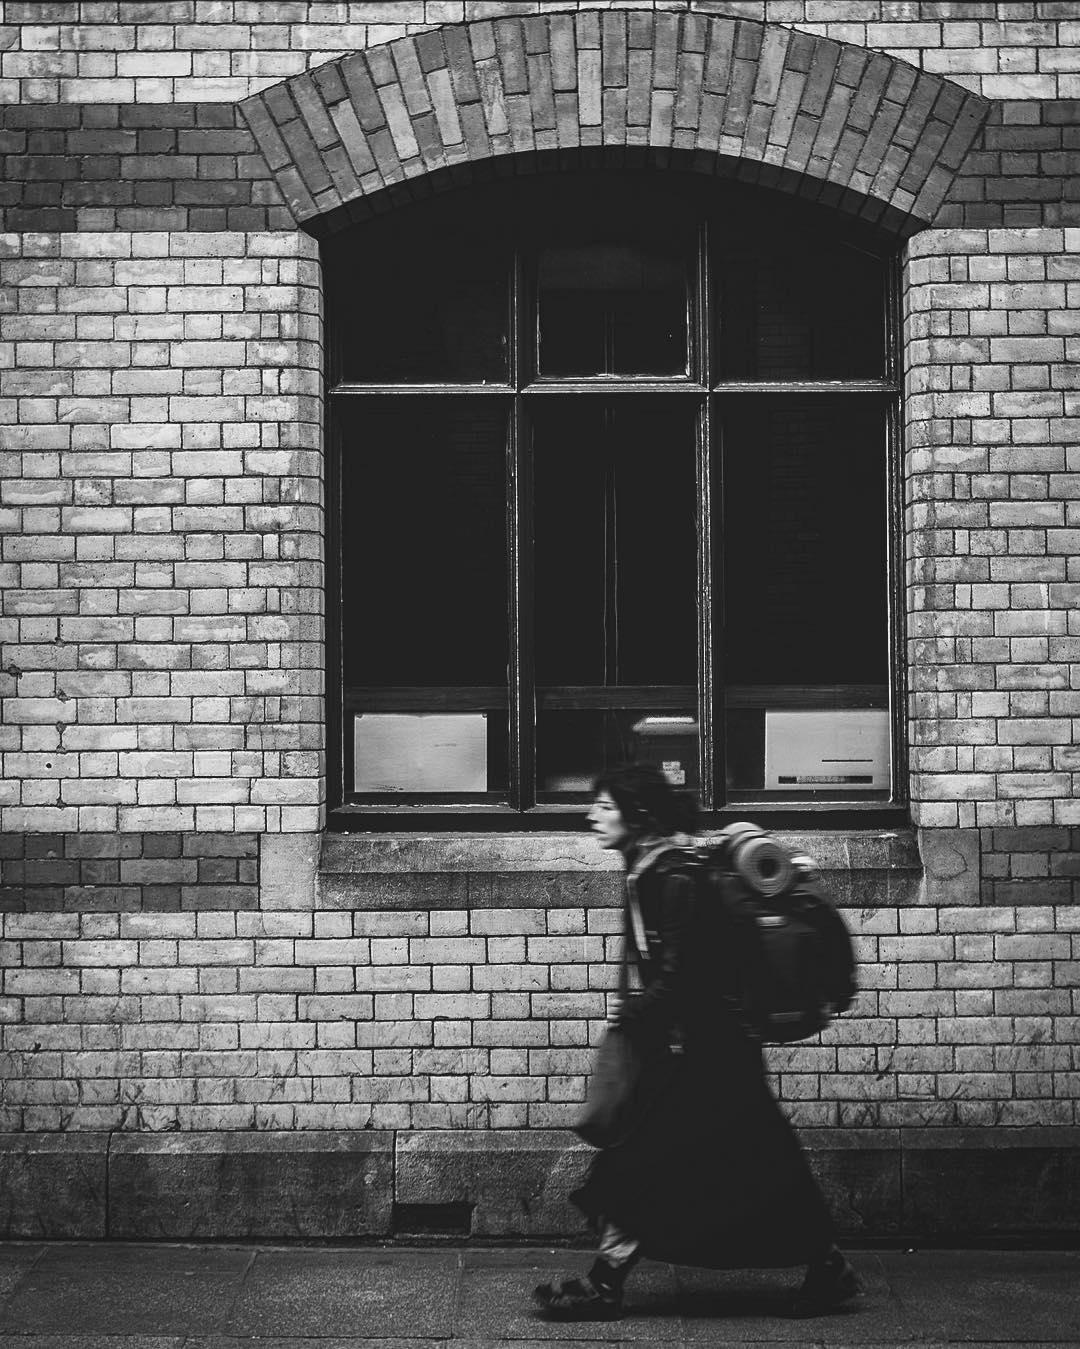 Dubliners #dublin #documentdublin #blackandwhite #ireland